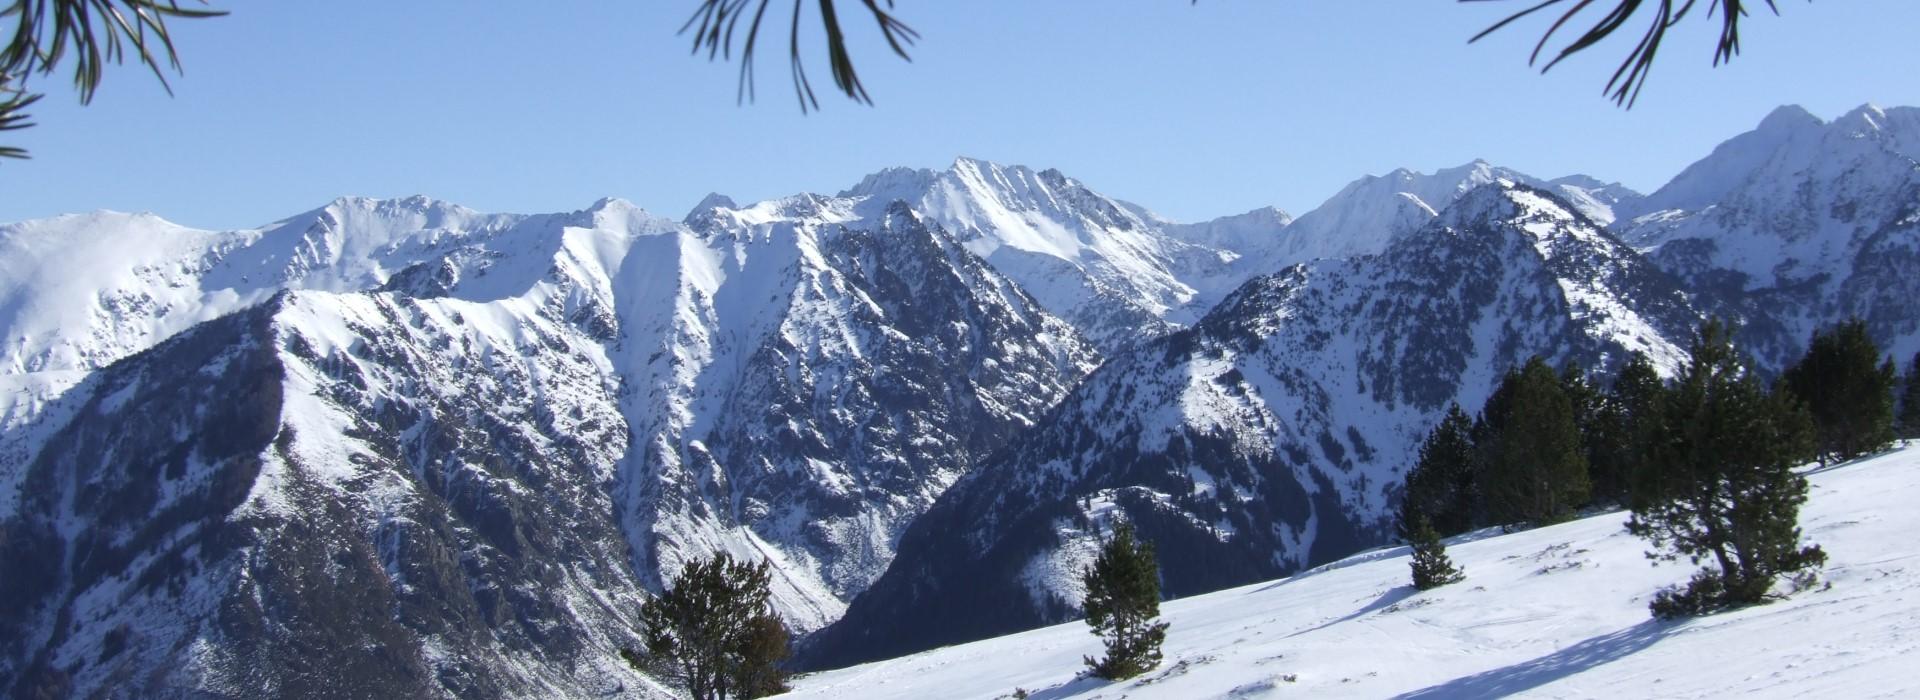 Ax 3 Domaines, Location de ski Ariège